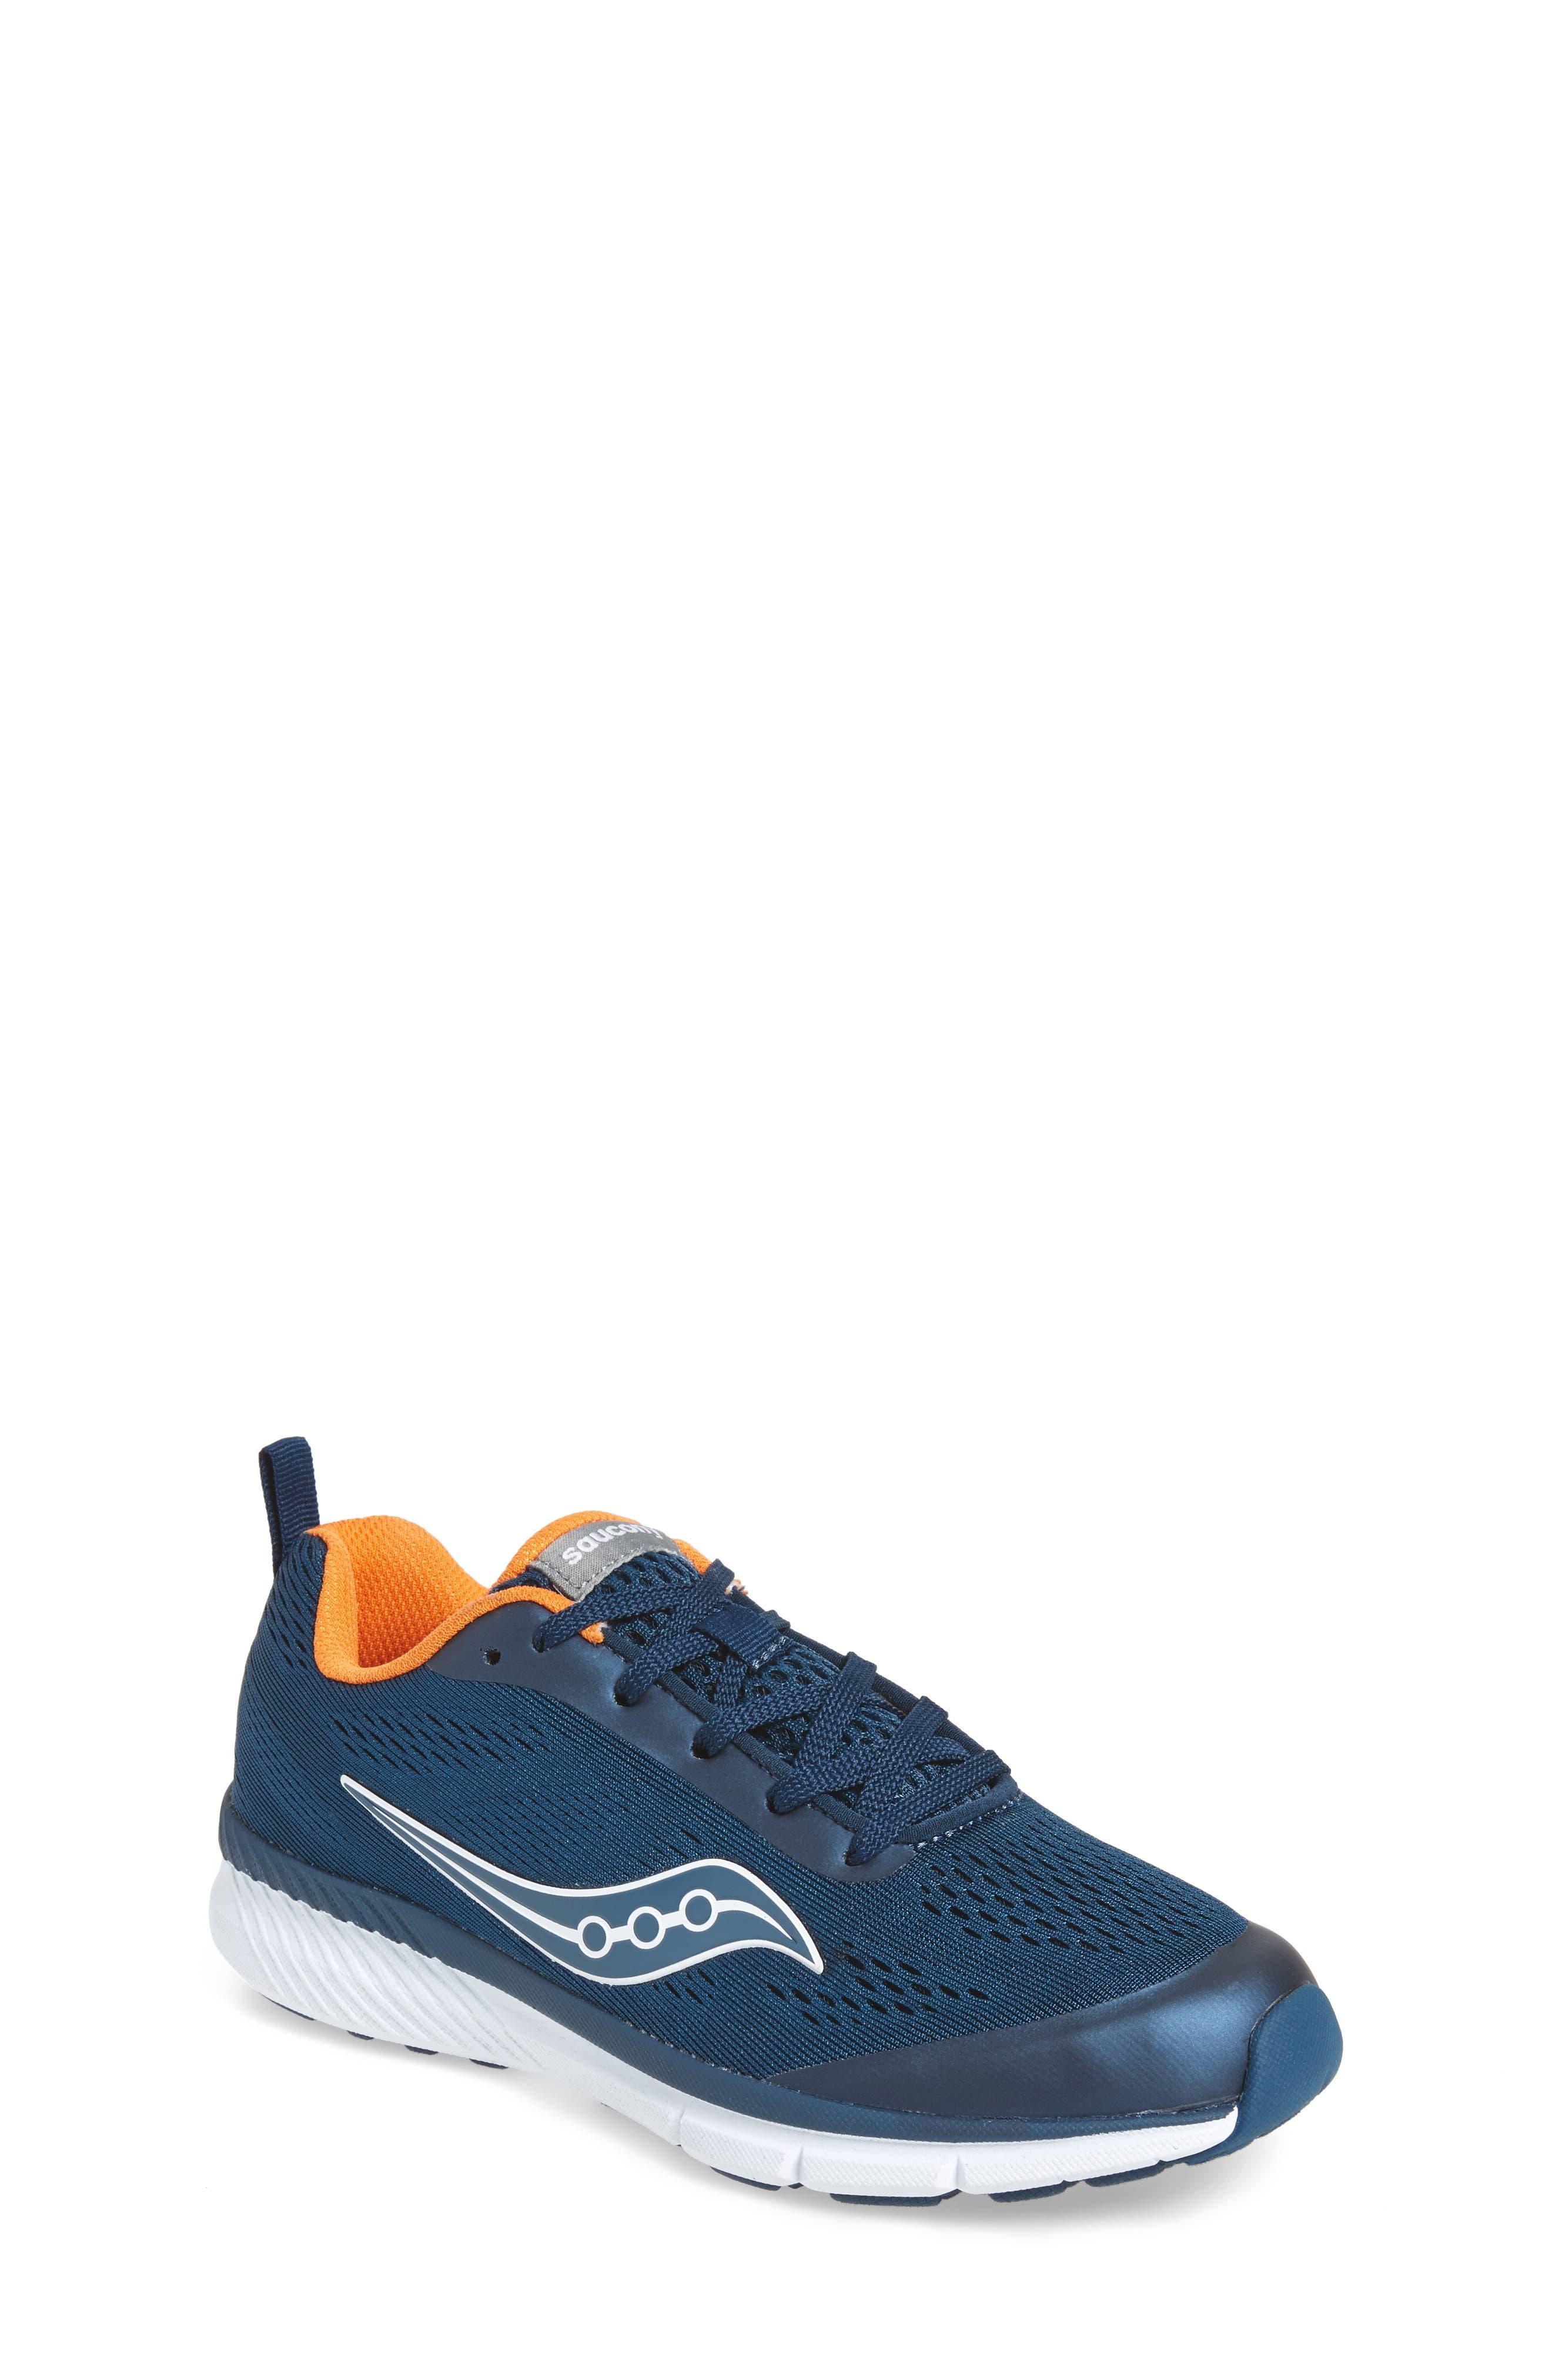 Alternate Image 1 Selected - Saucony Ideal Sneaker (Toddler, Little Kid & Big Kid)